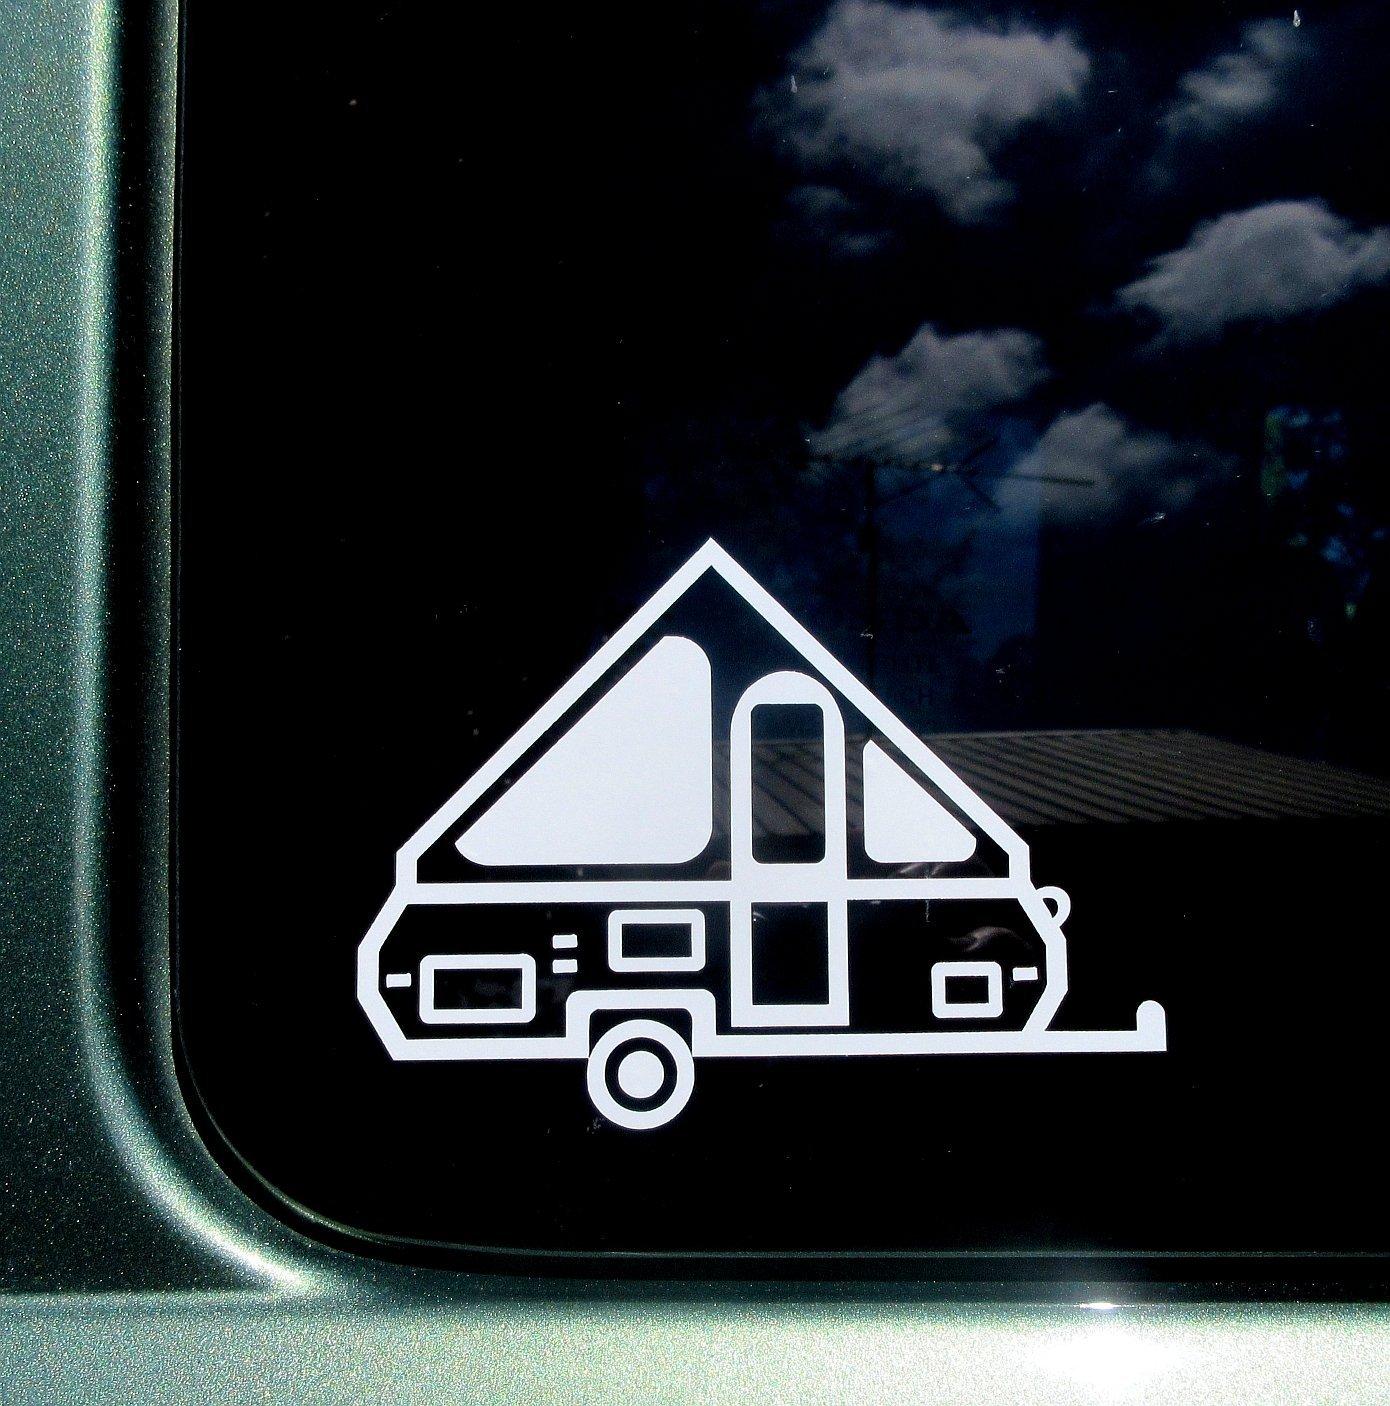 A-frame Pop Up Camper Travel Trailer Vinyl Car Window Decal